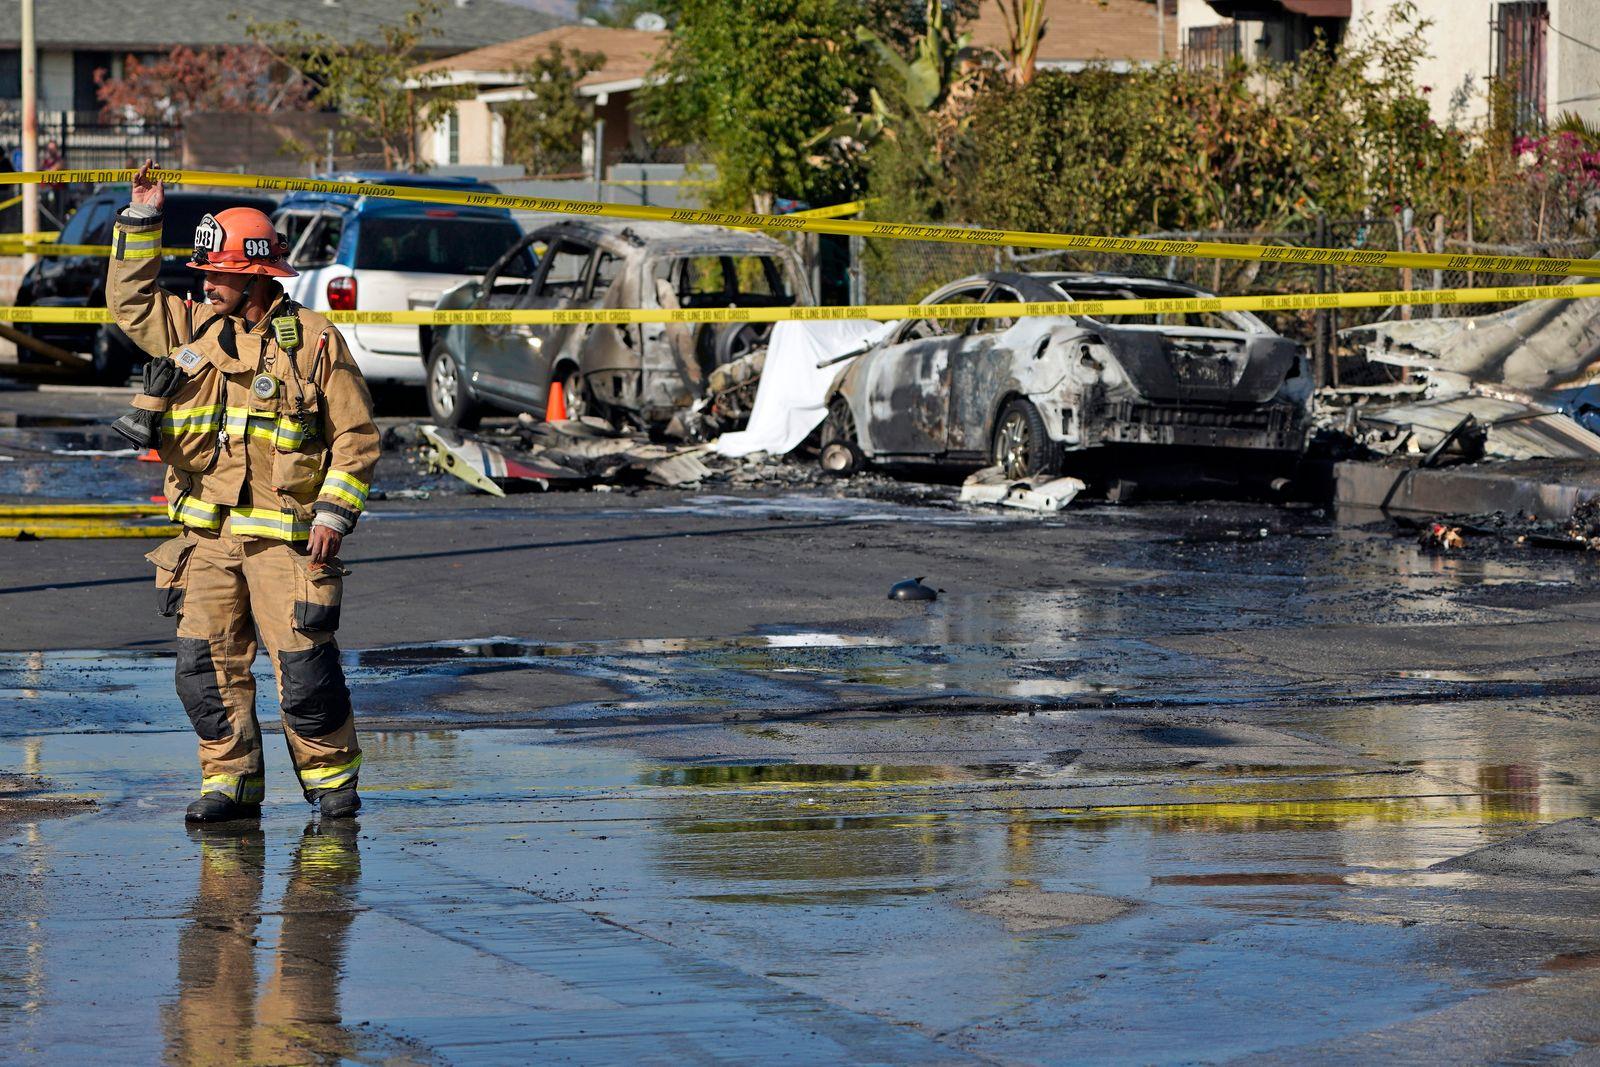 Los Angeles Small Plane Crash